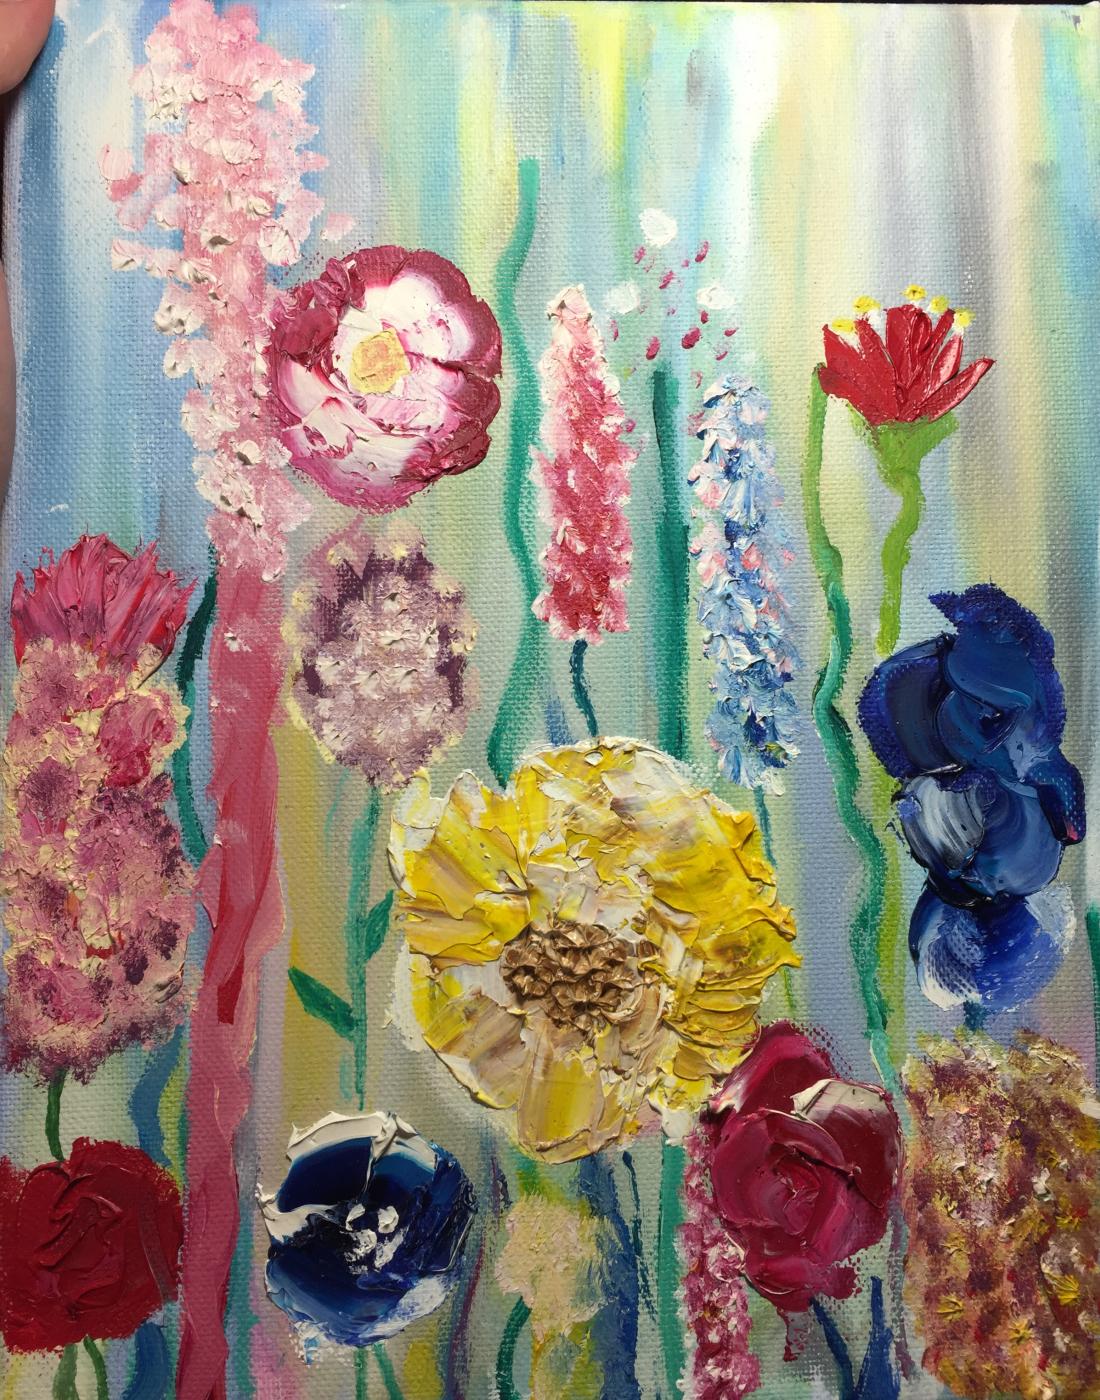 Unknown artist. Dance of flowers